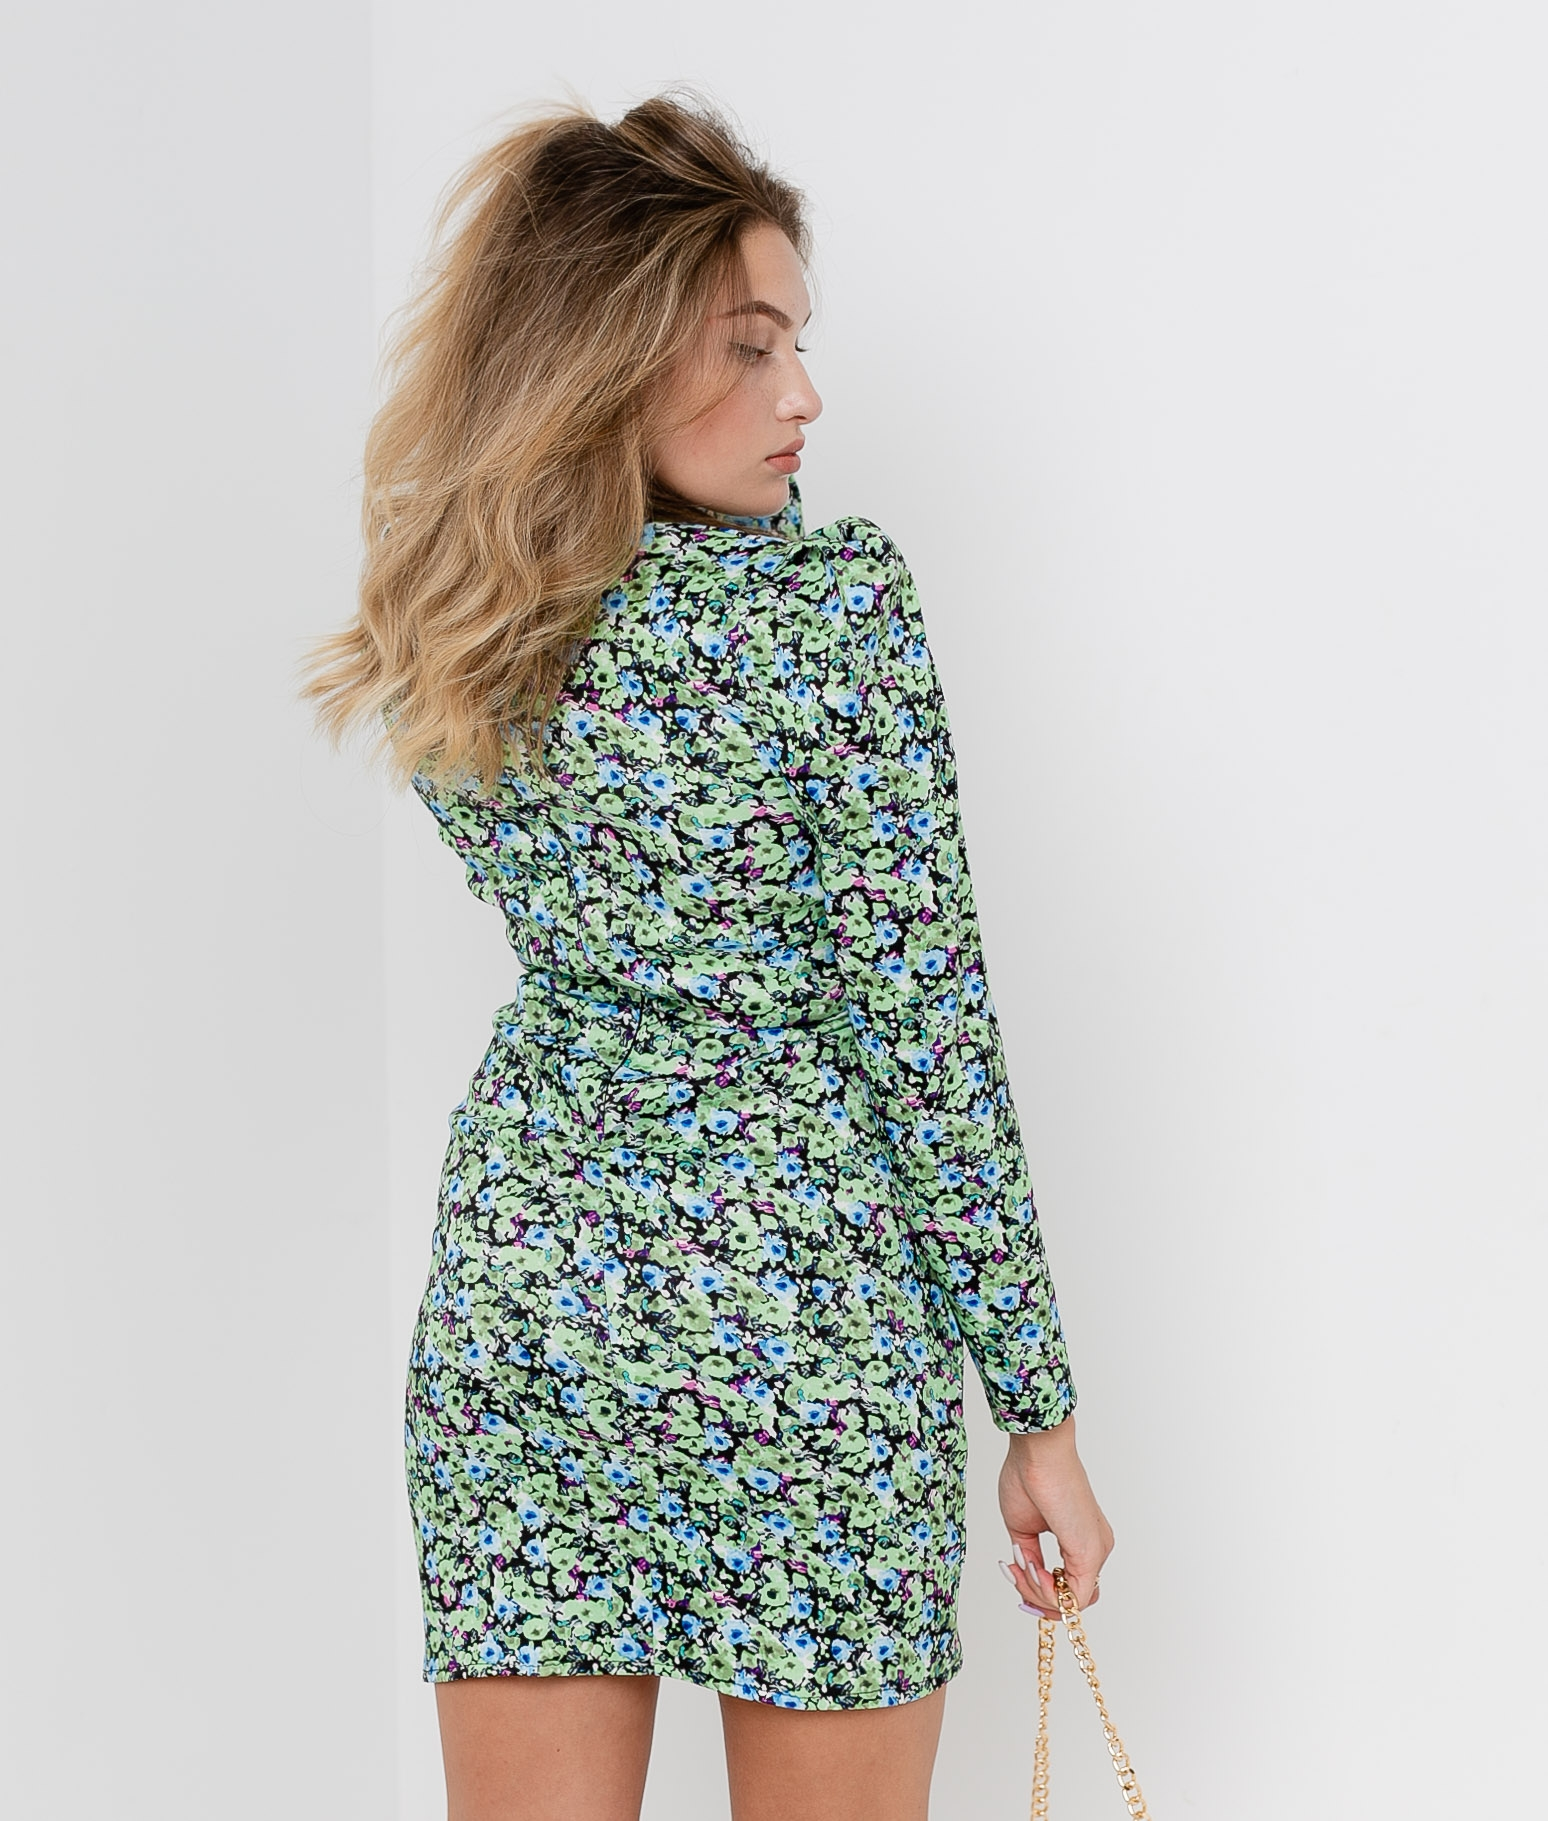 Dress Narla - Green